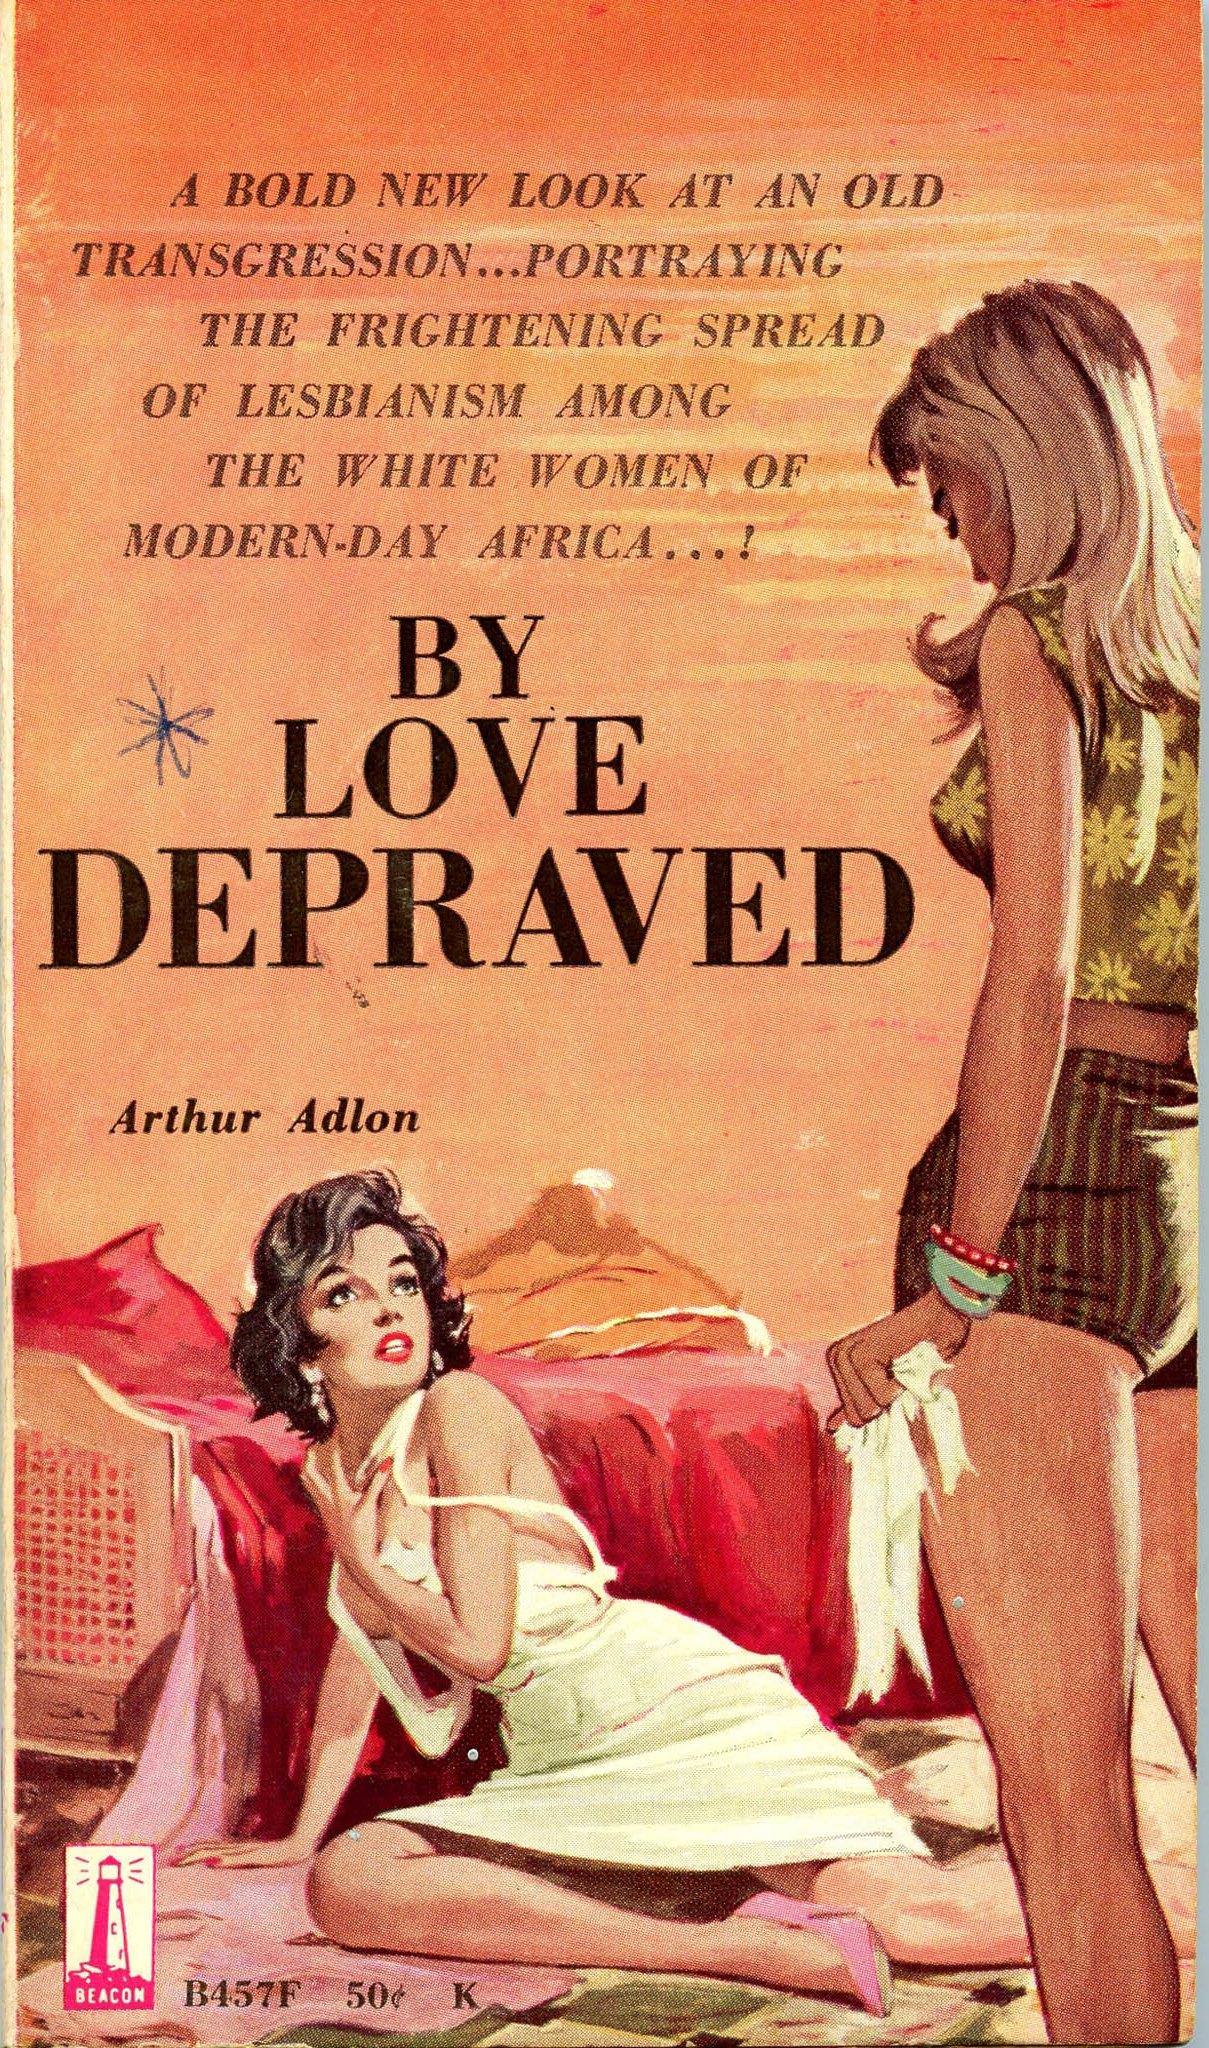 depraved lesbians